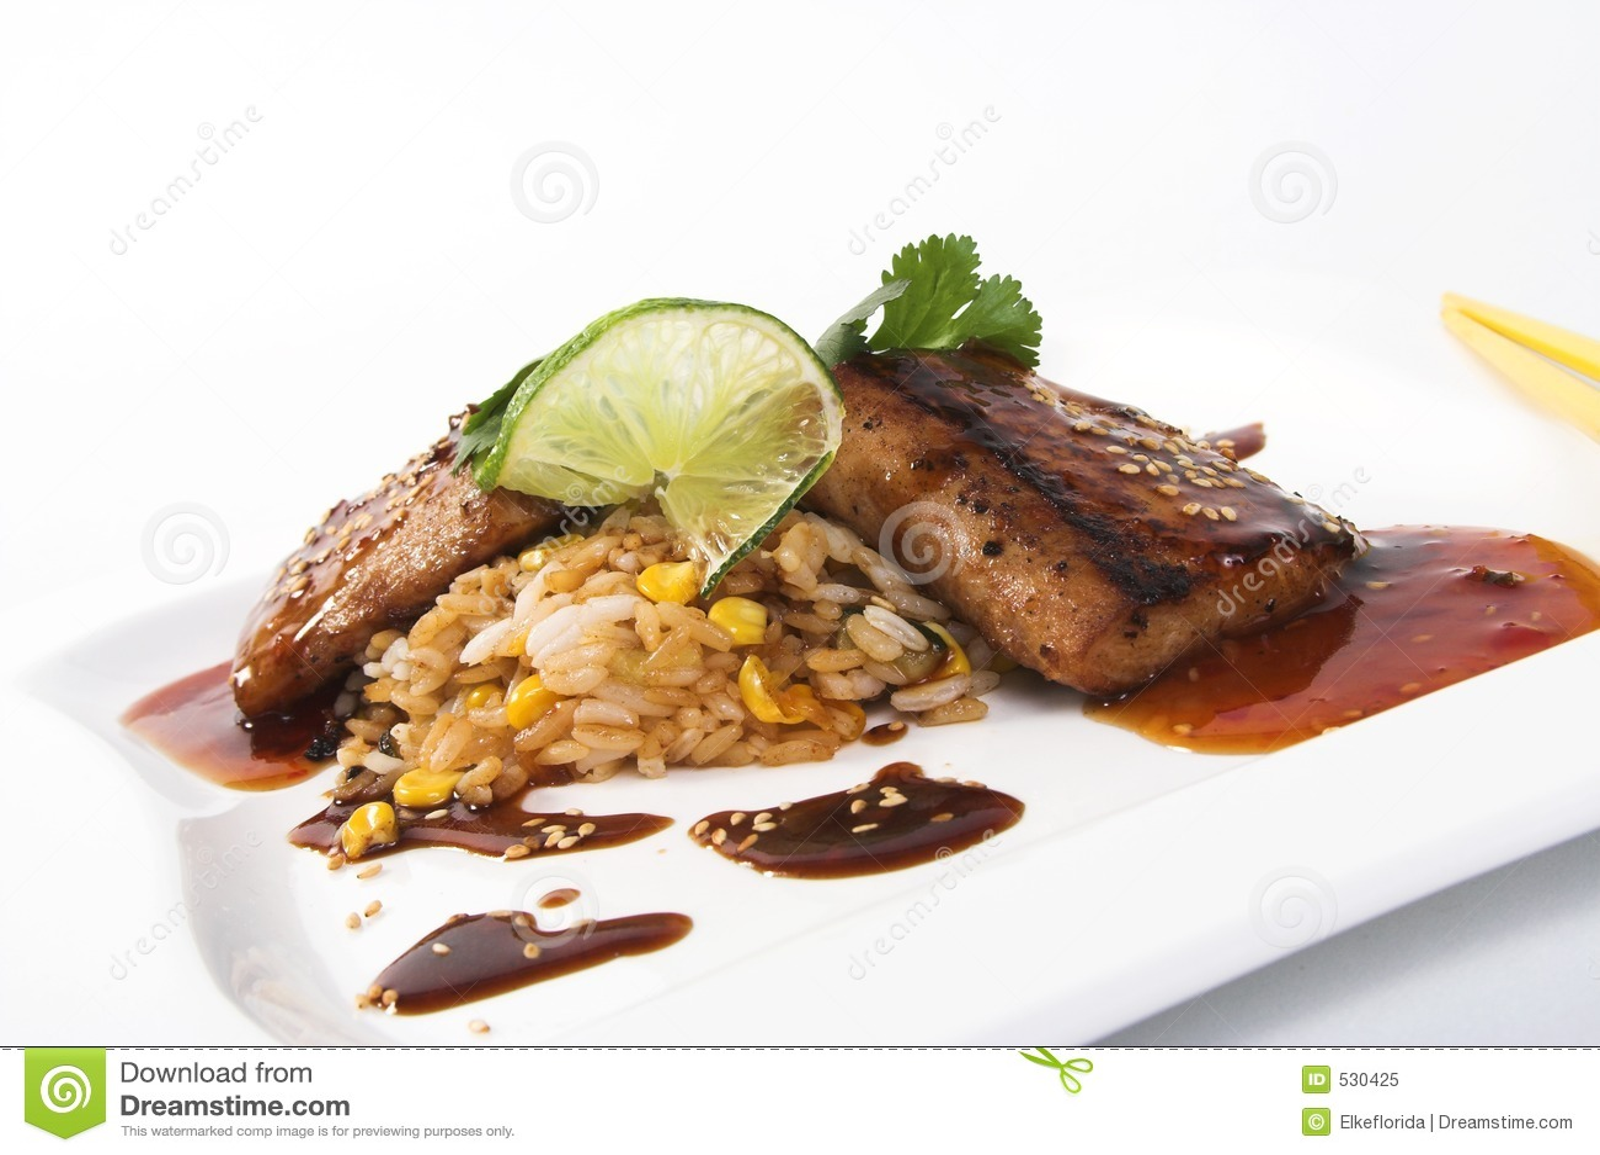 Faixa de peixes com molho e arroz de soja